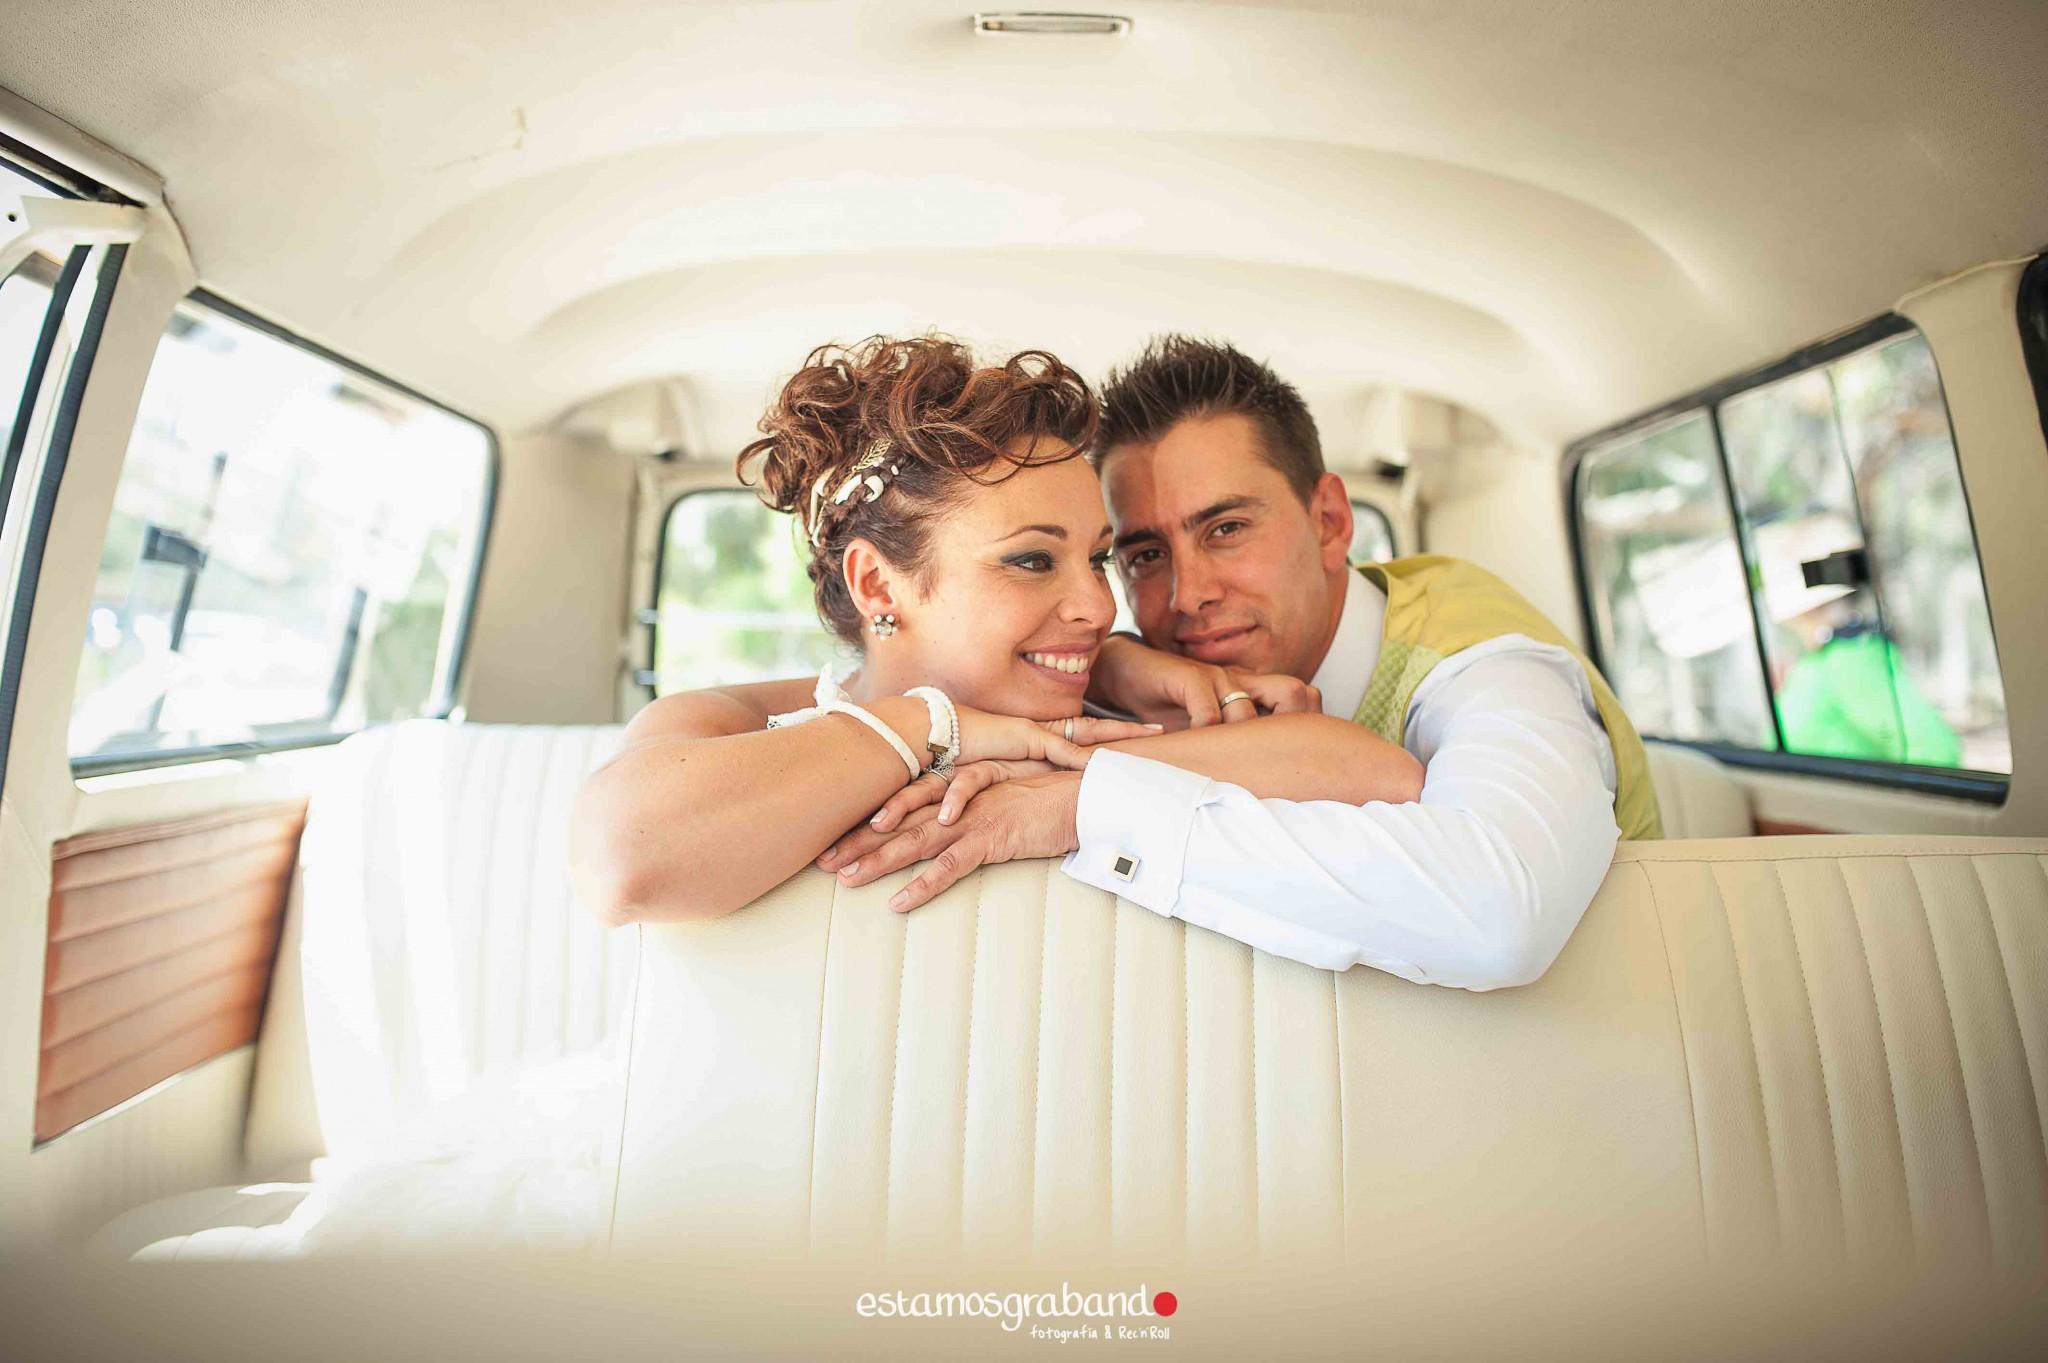 pili-y-jose_fotograficc81a-cadiz-73 Pili & Jose - video boda cadiz